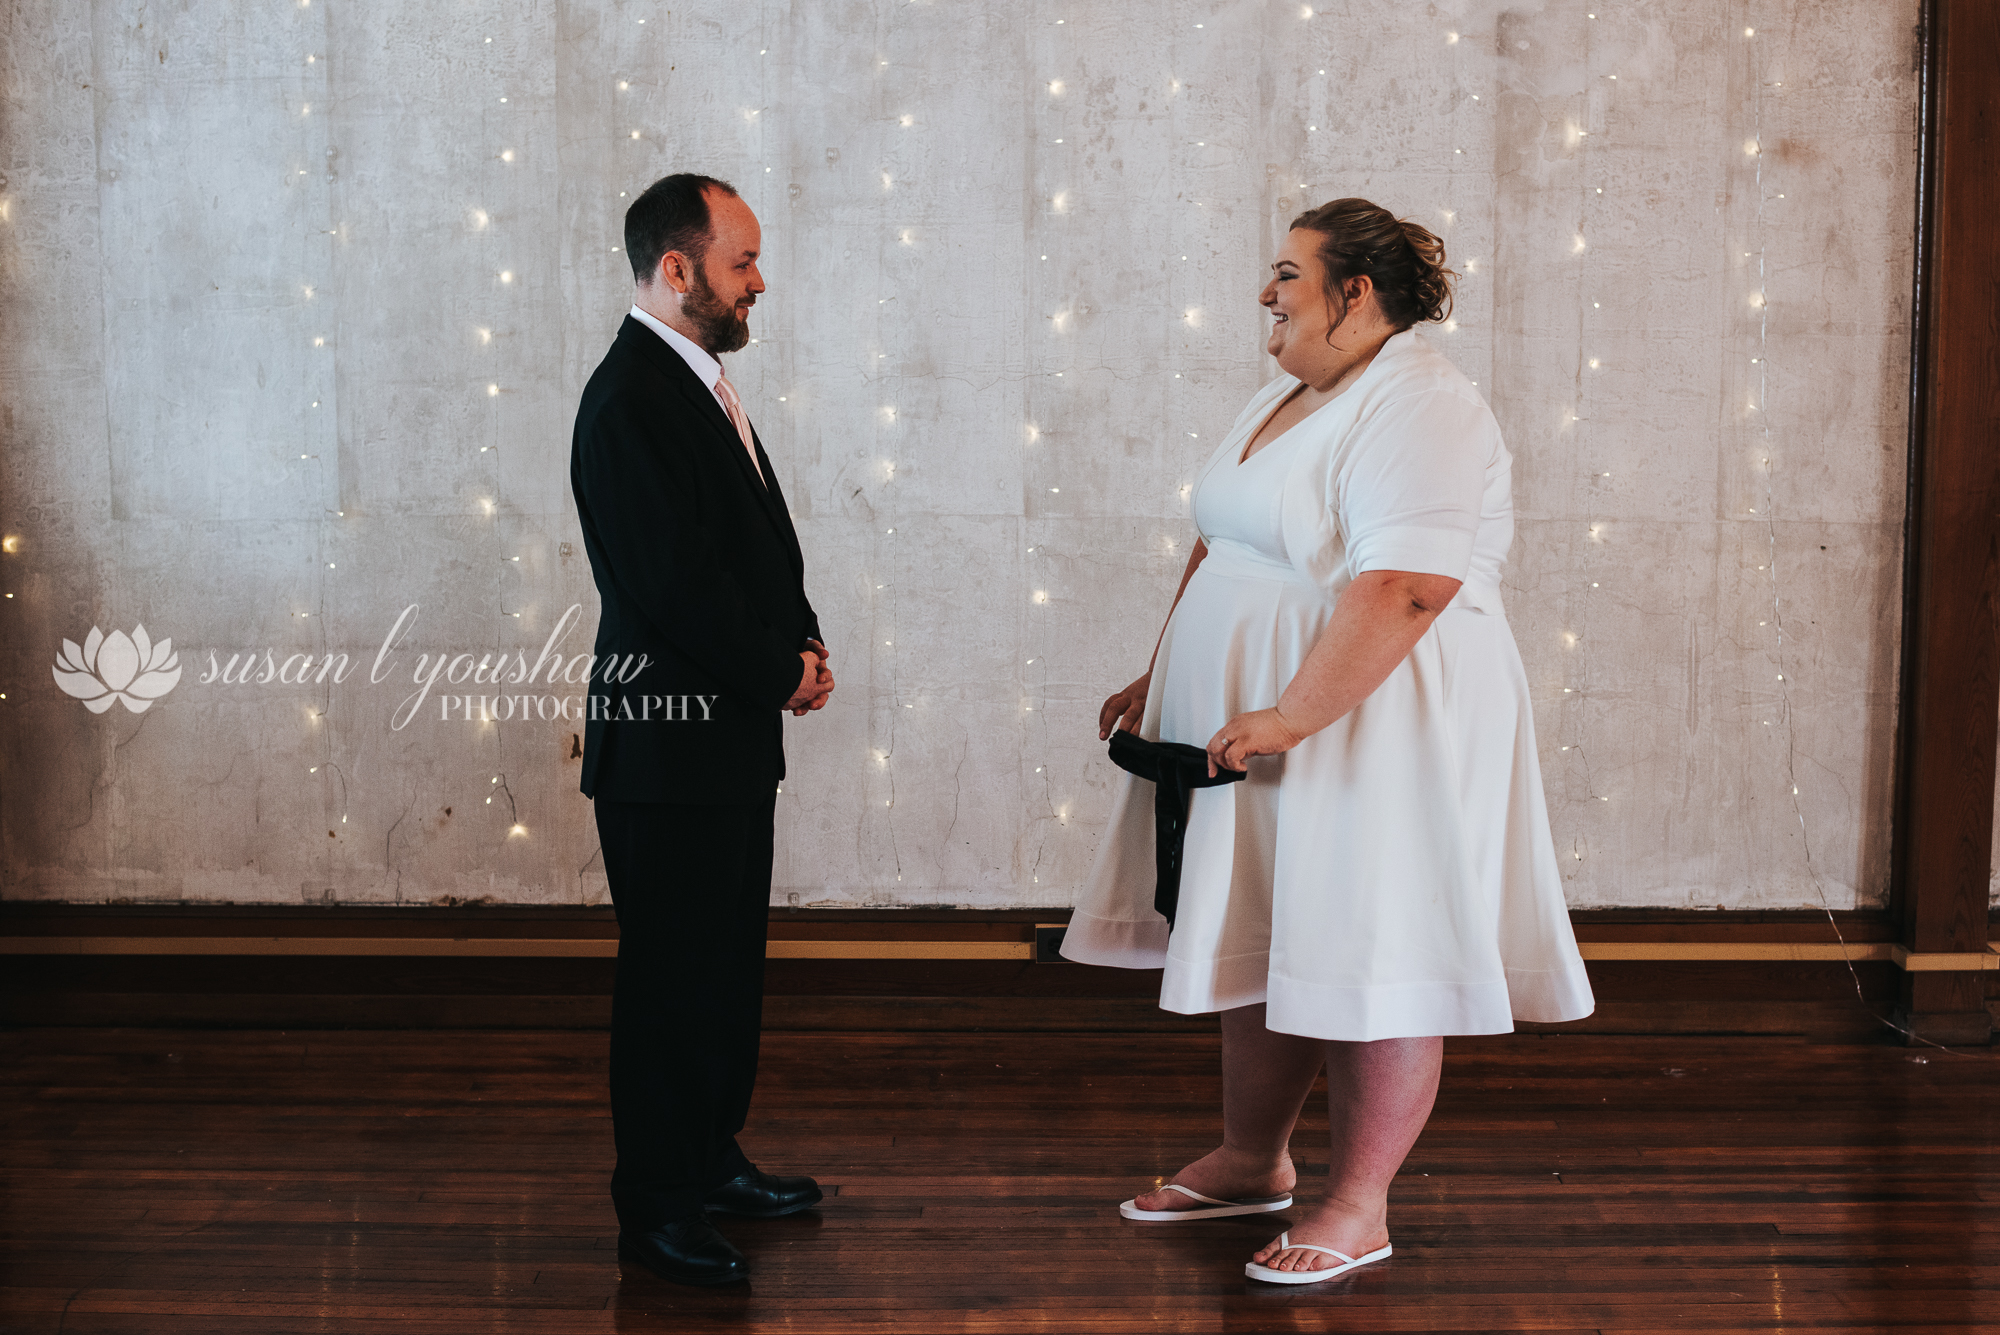 Bill and Sarah Wedding Photos 06-08-2019 SLY Photography -9.jpg